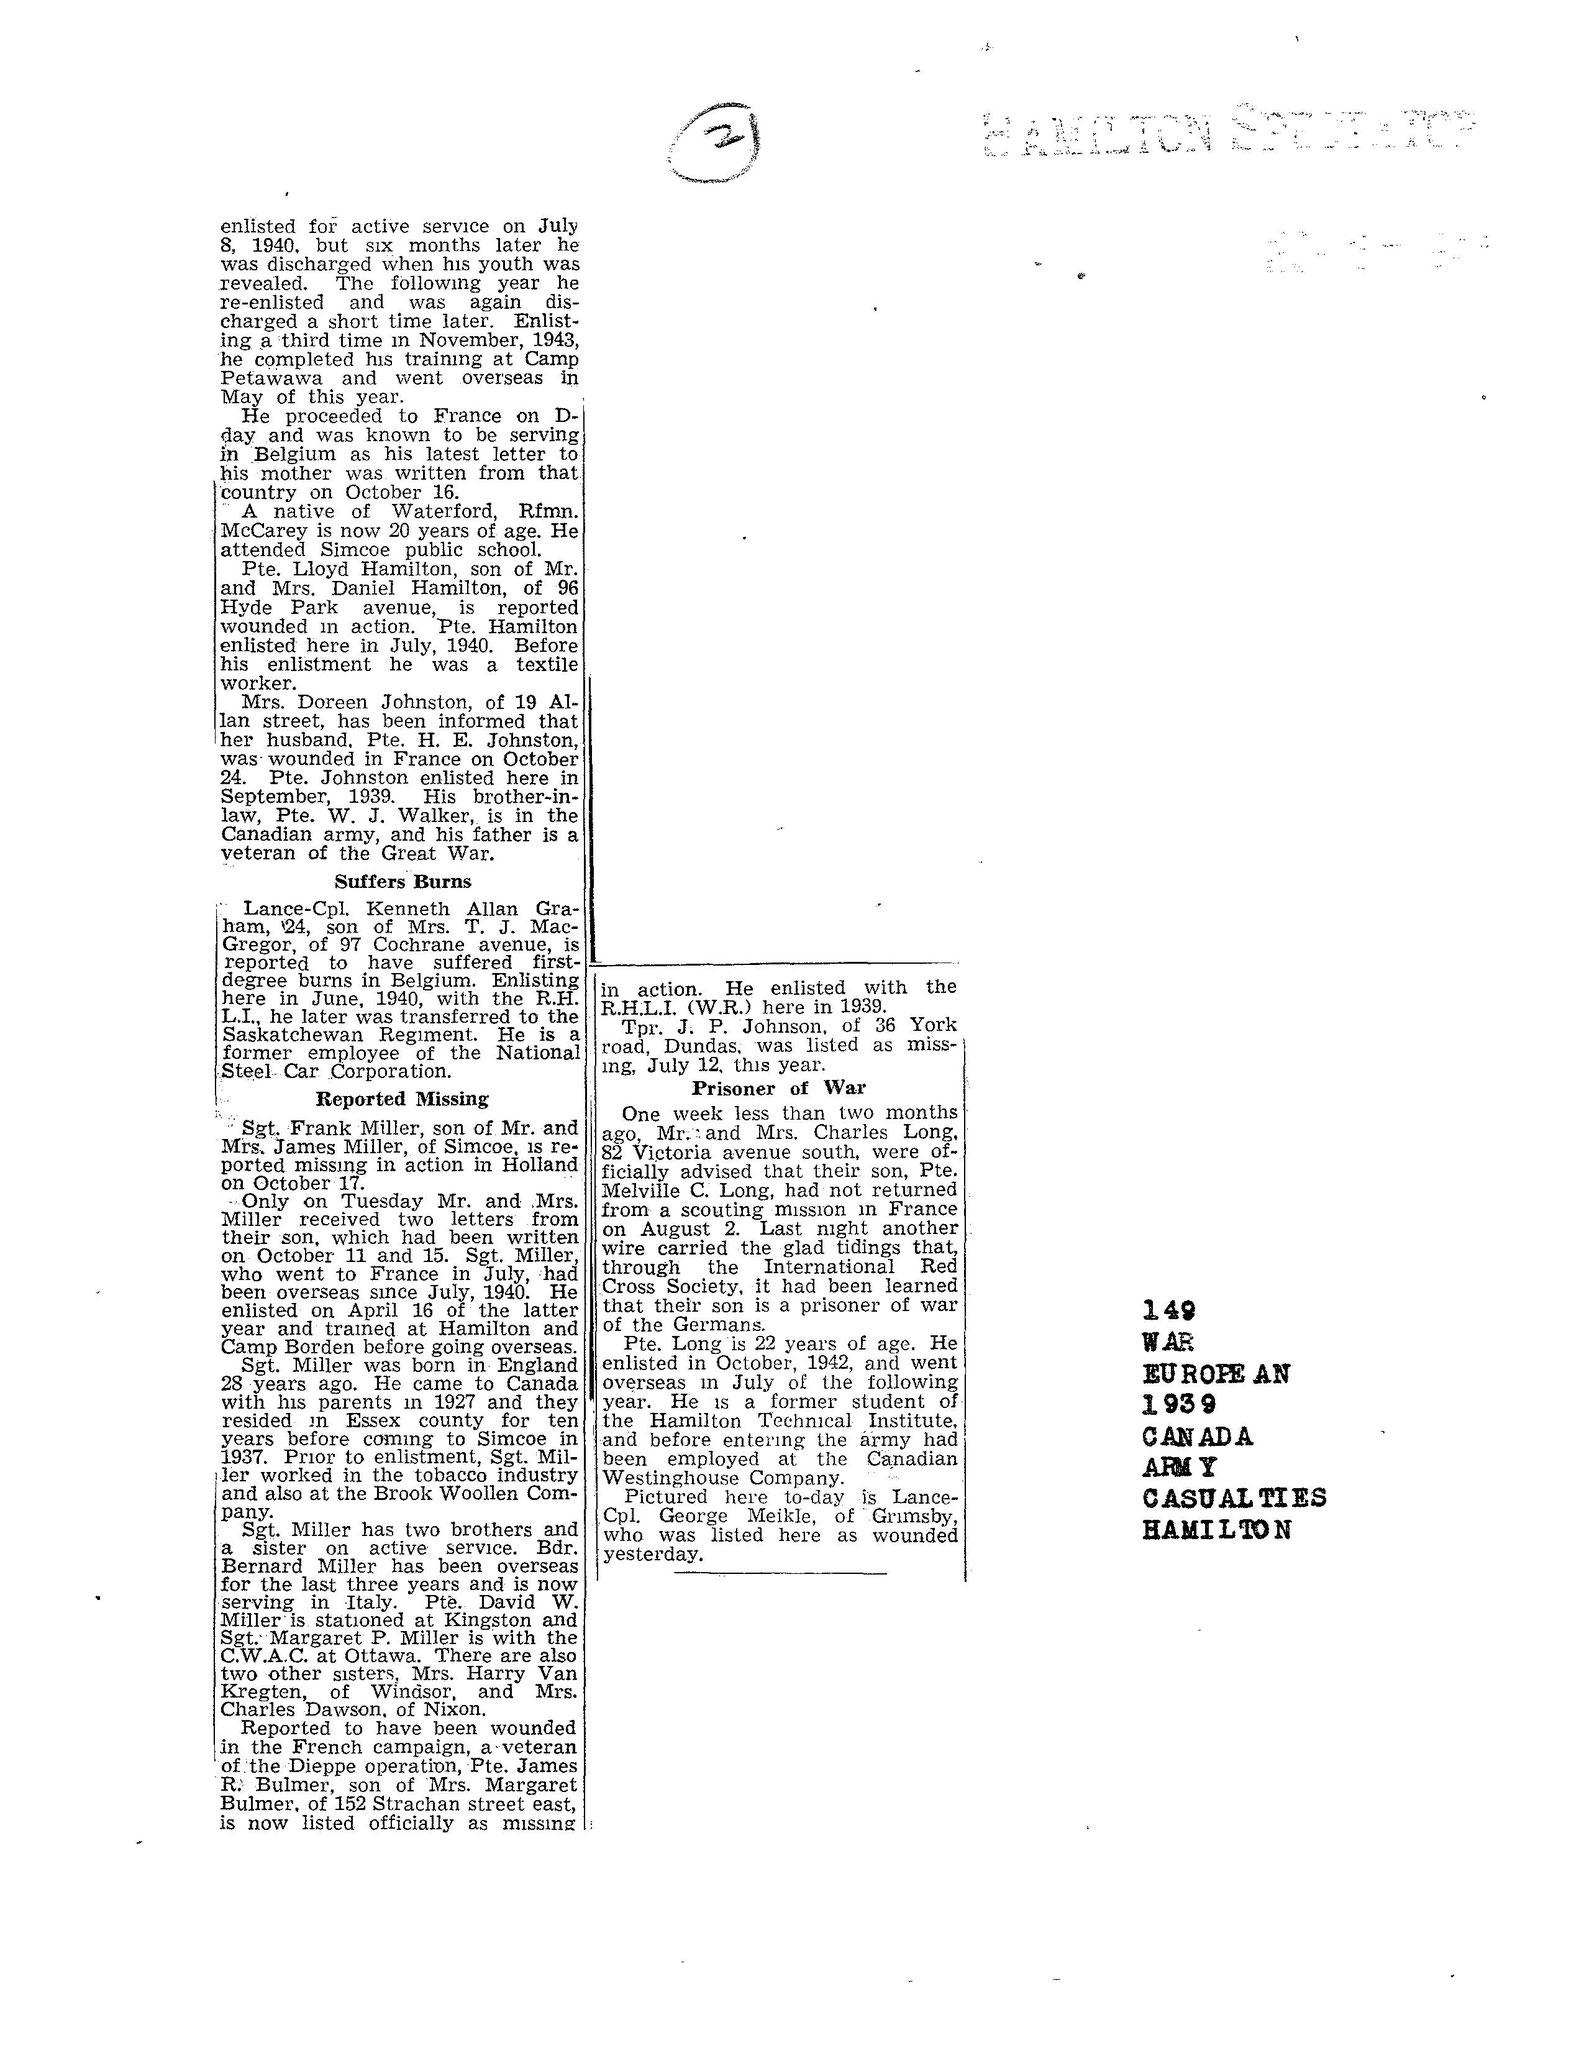 Hamilton Spectator 2-11-1944